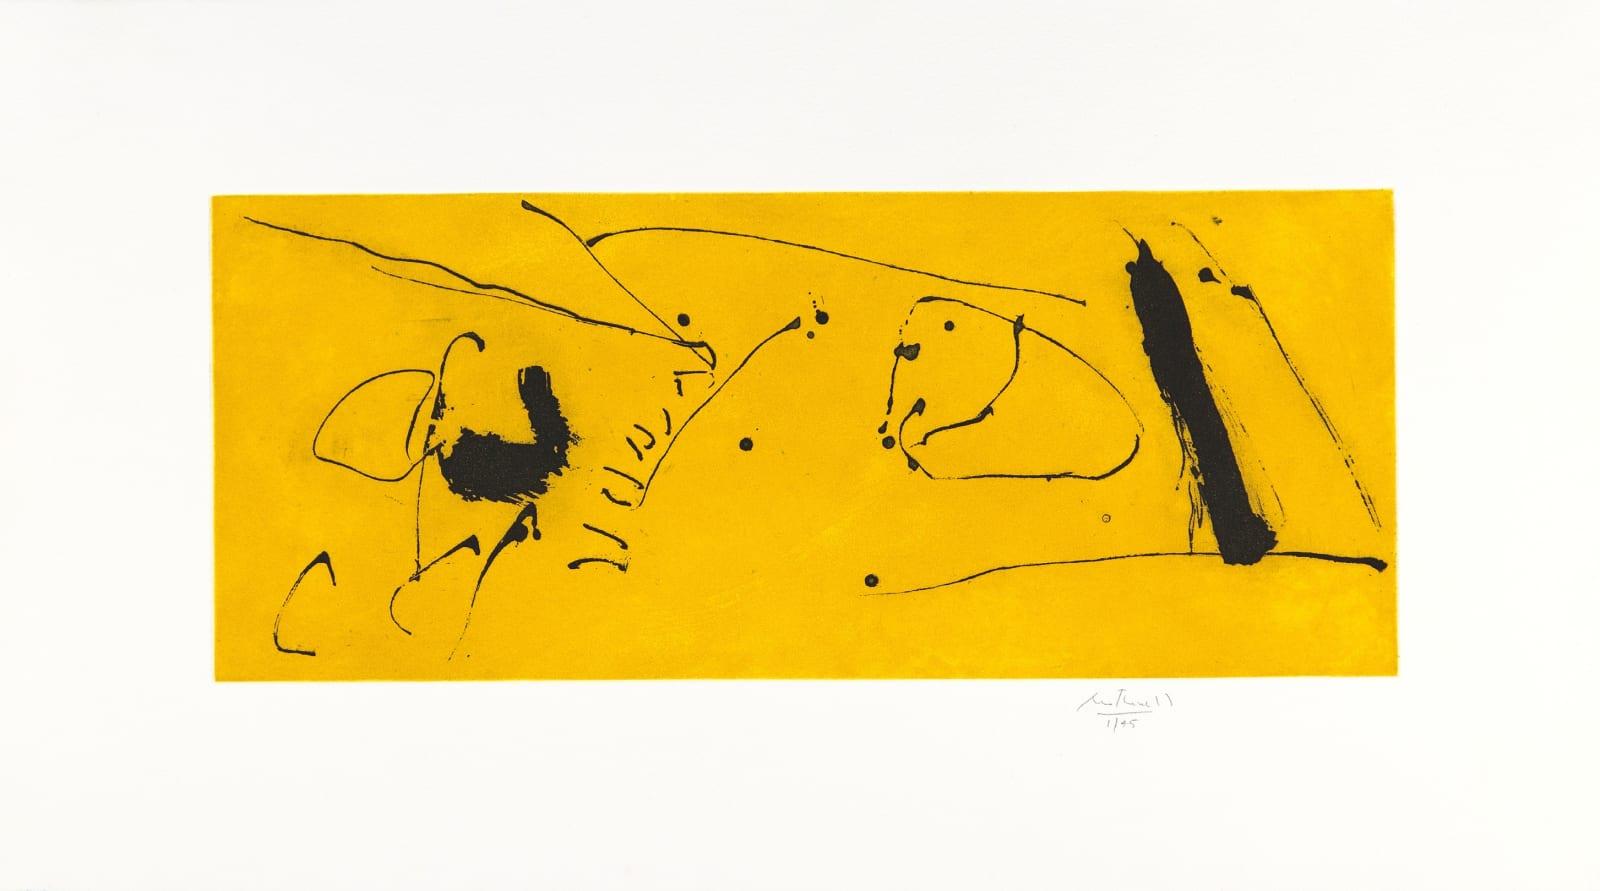 Robert Motherwell Yellow Flight, 1986